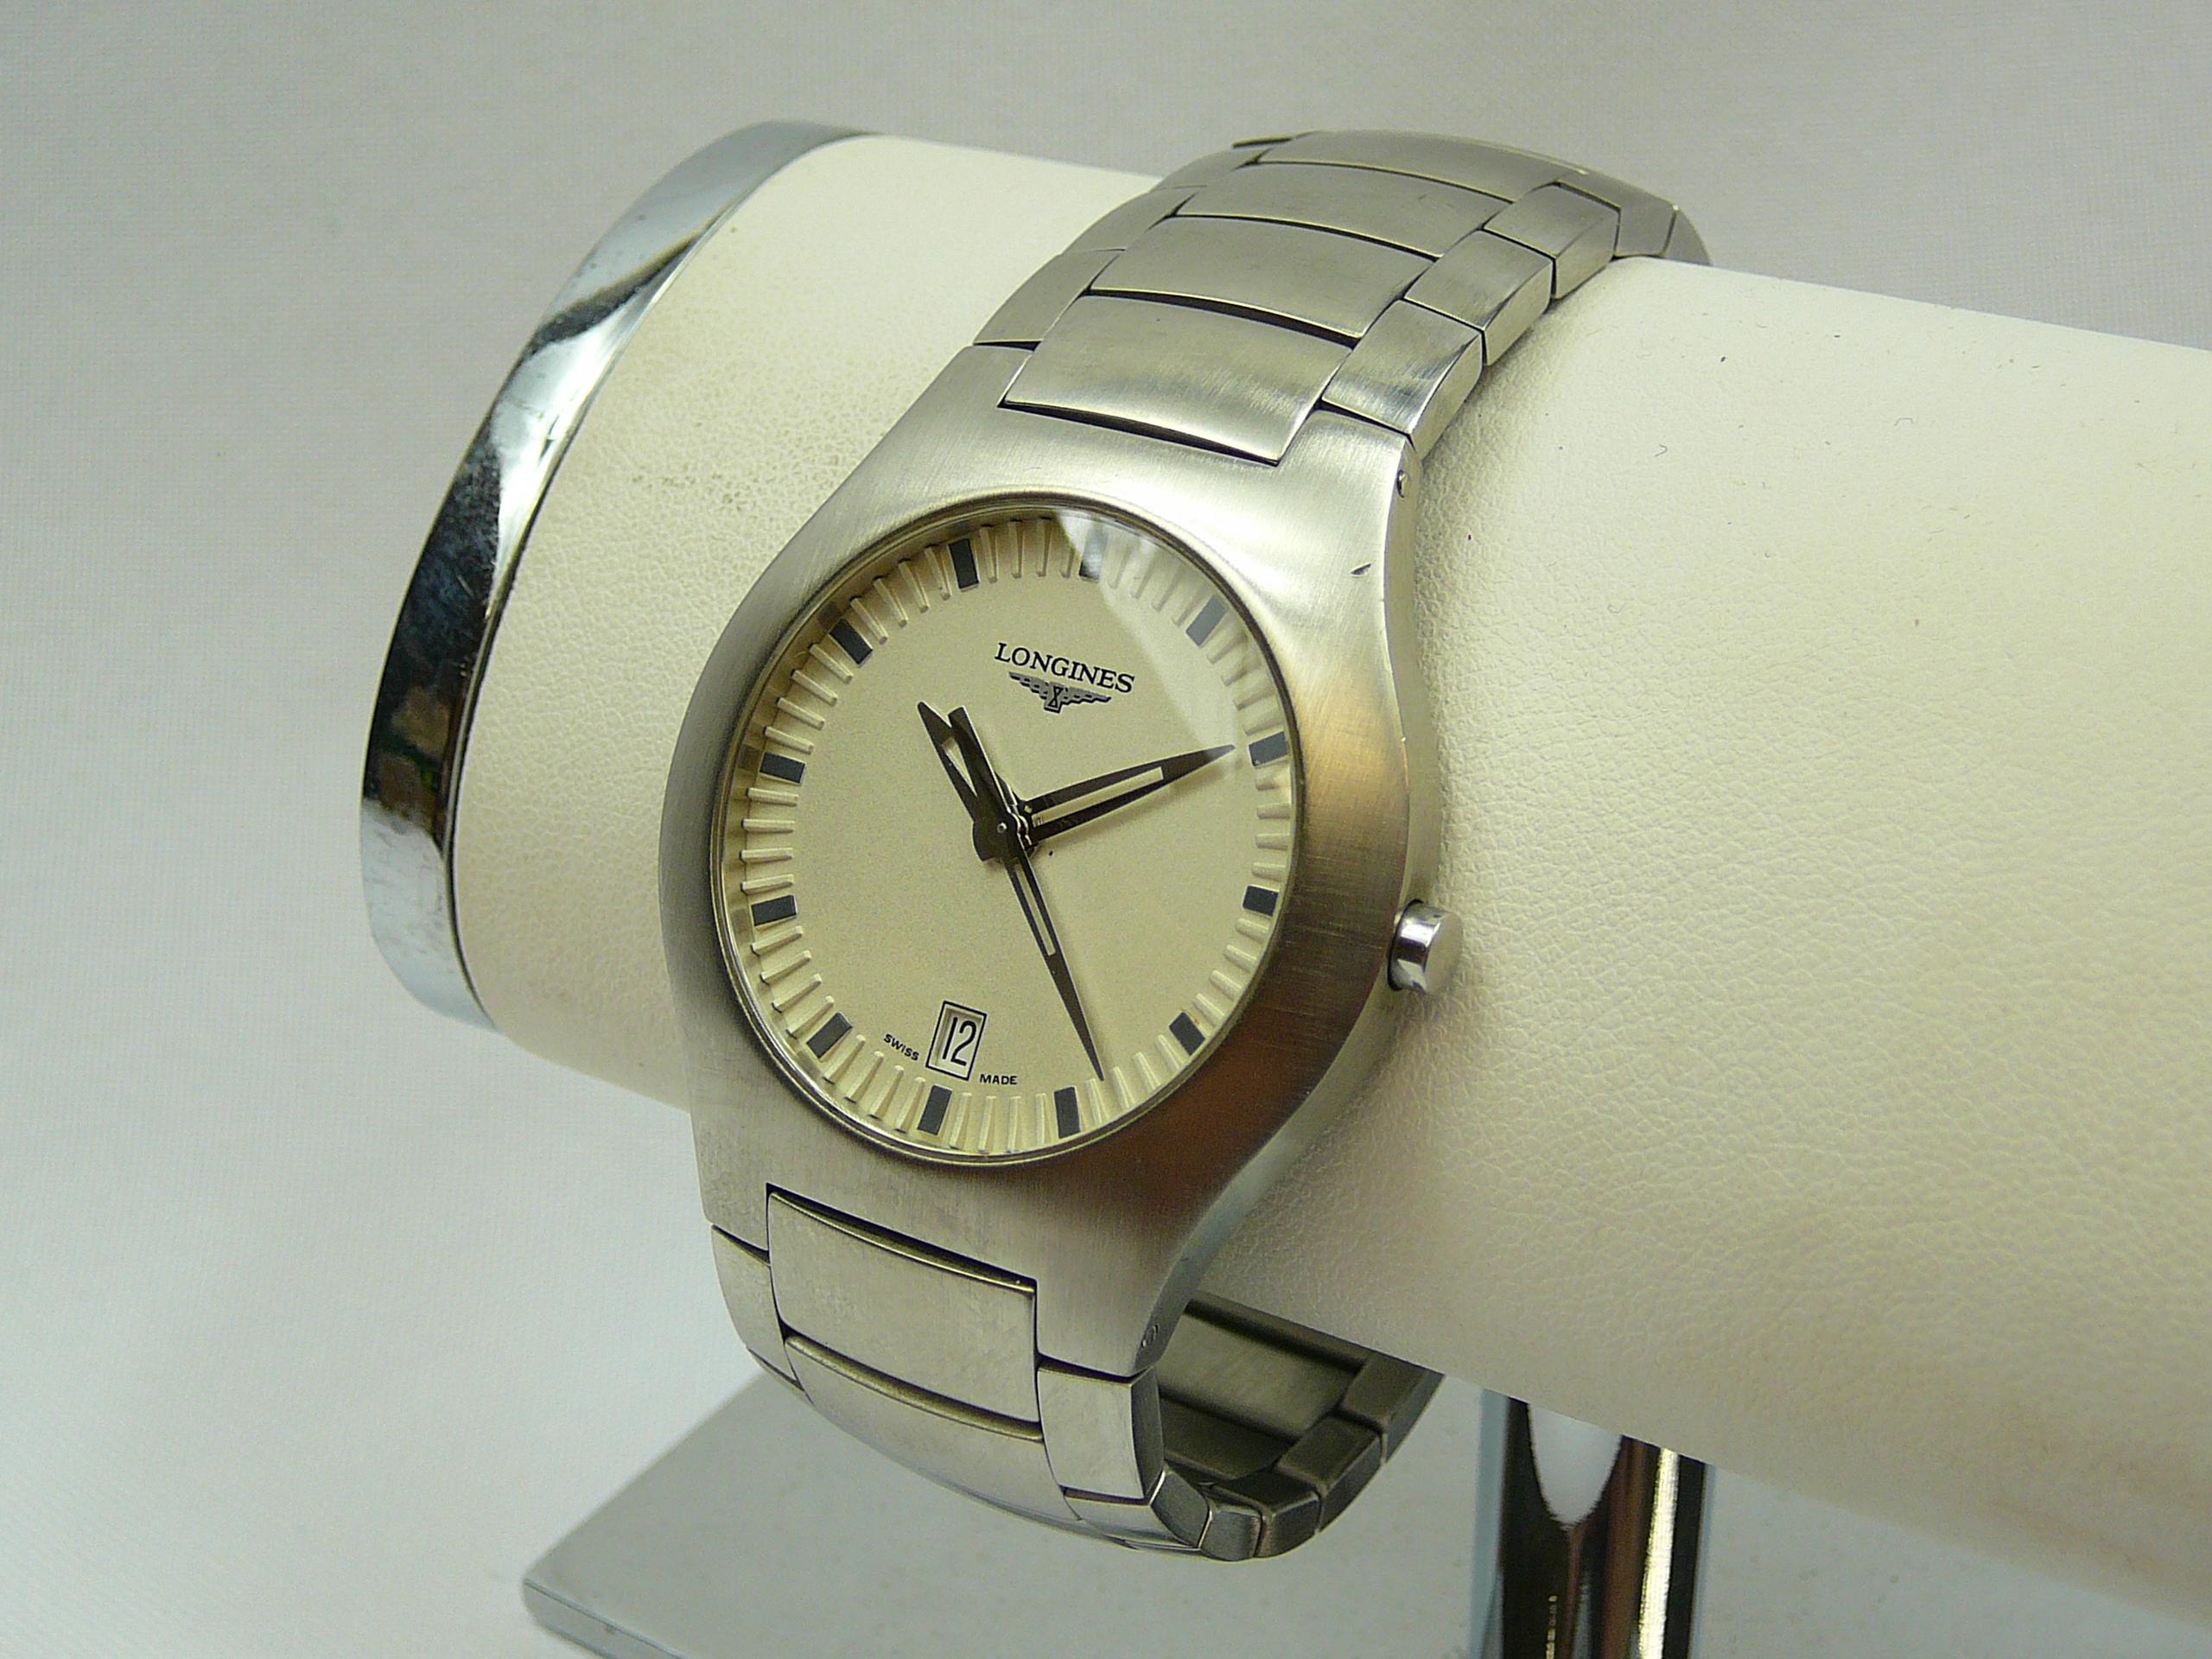 Gents Longines Wrist Watch - Image 2 of 3